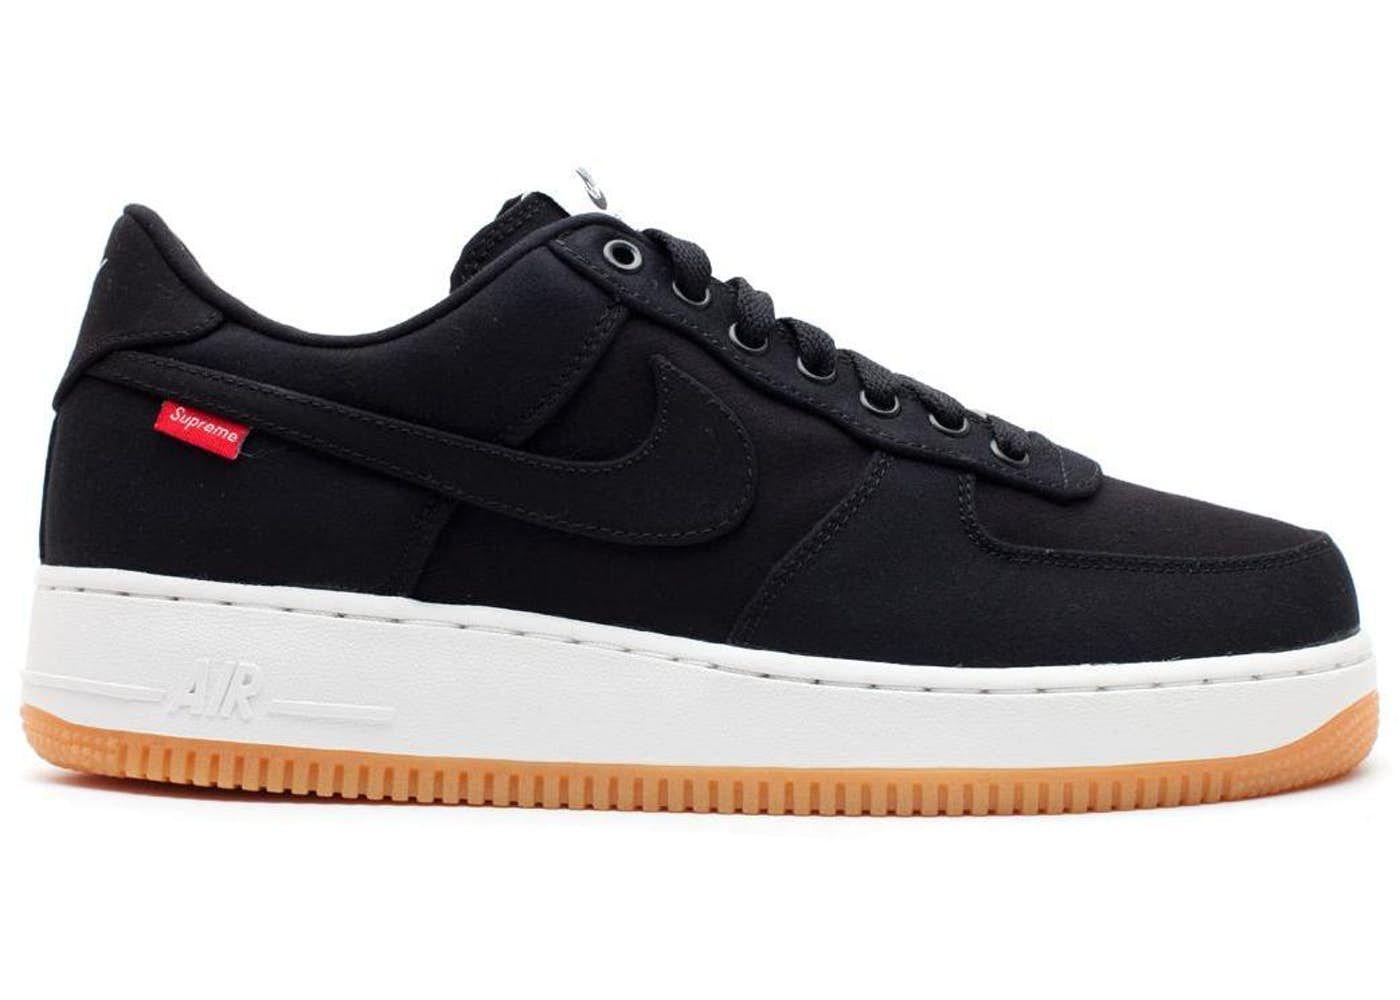 Nike Force 1 Low Supreme Black   Air force, Air force 1, Black